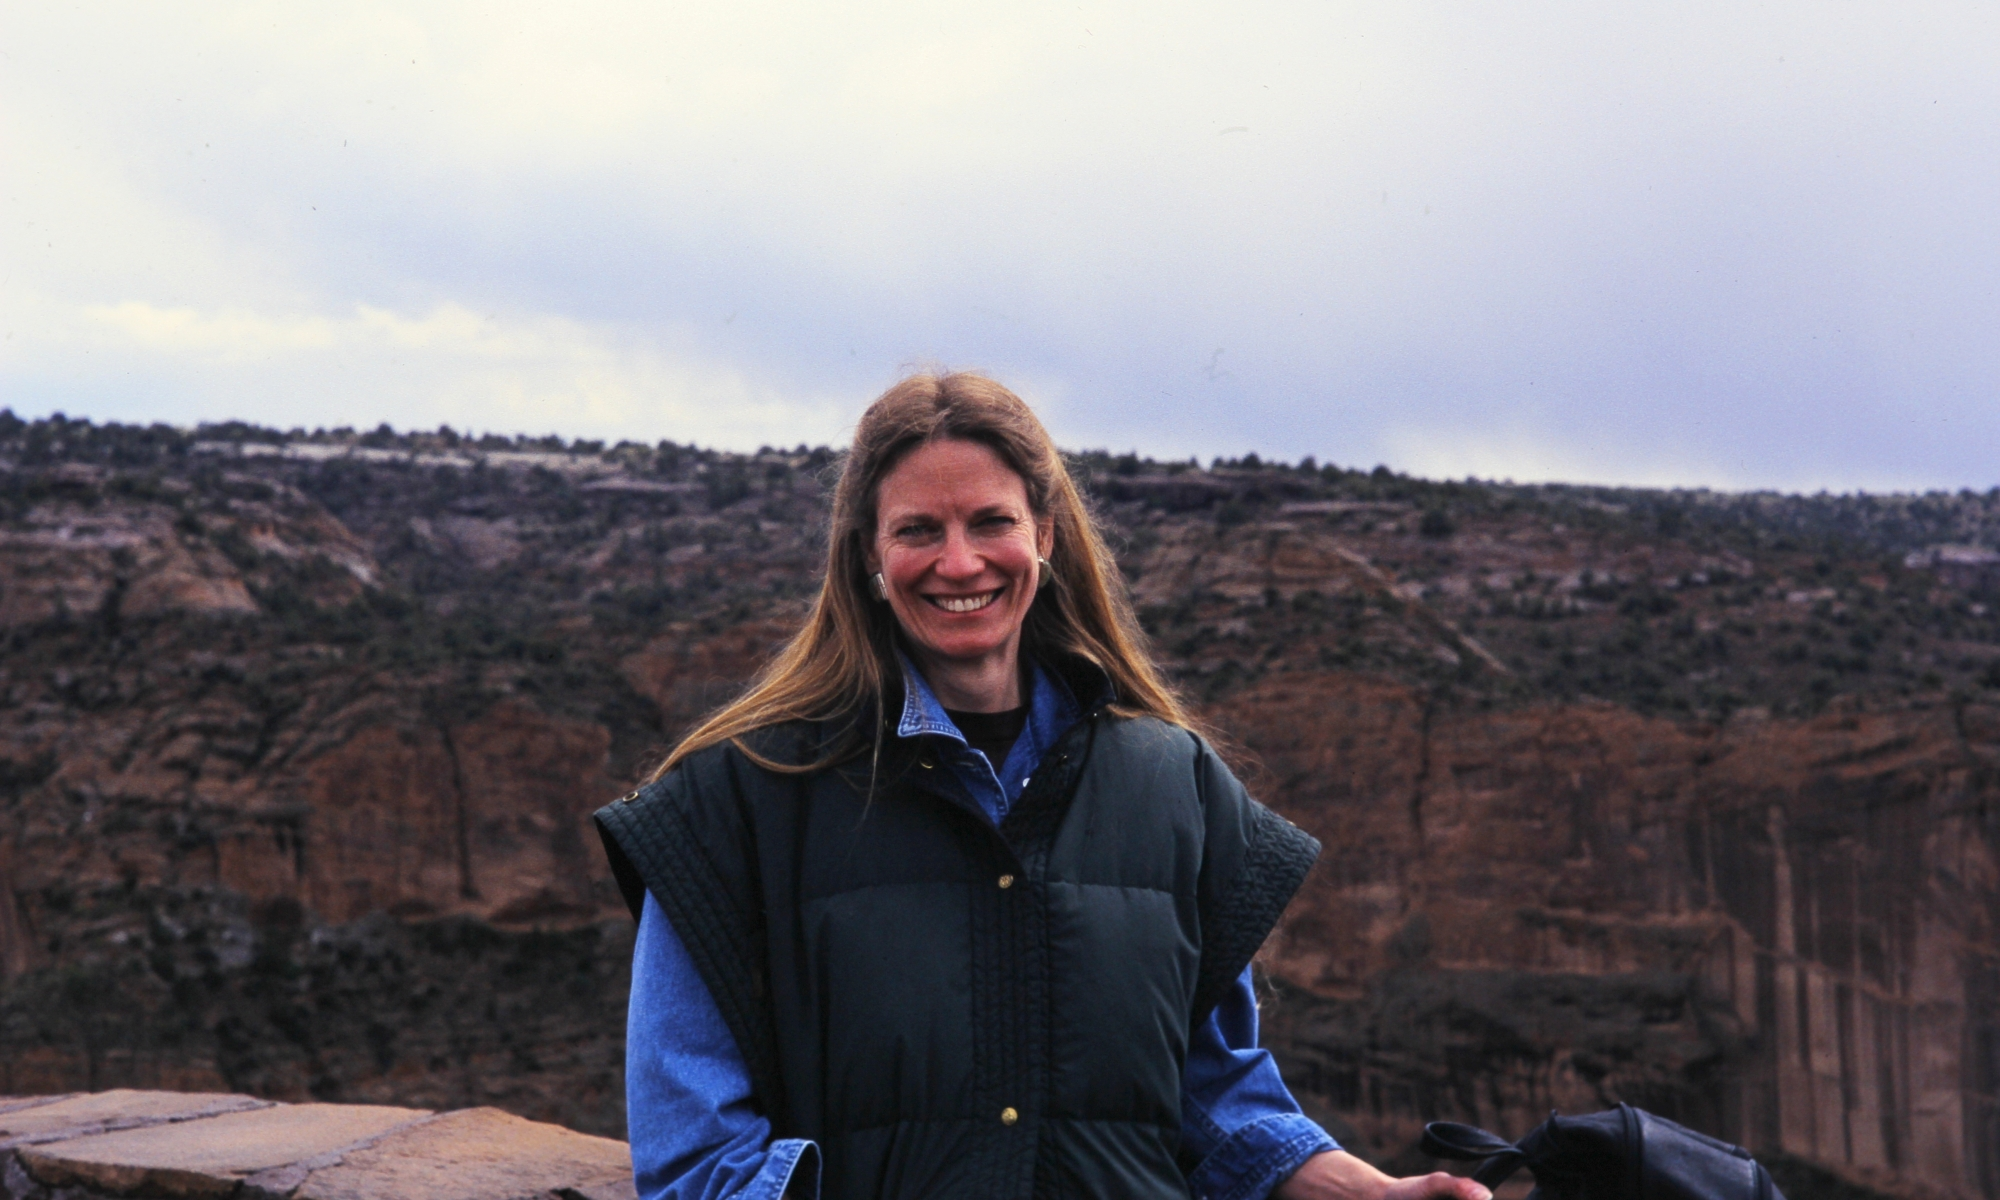 Malinda Stafford Blustain in New Mexico, circa 2002